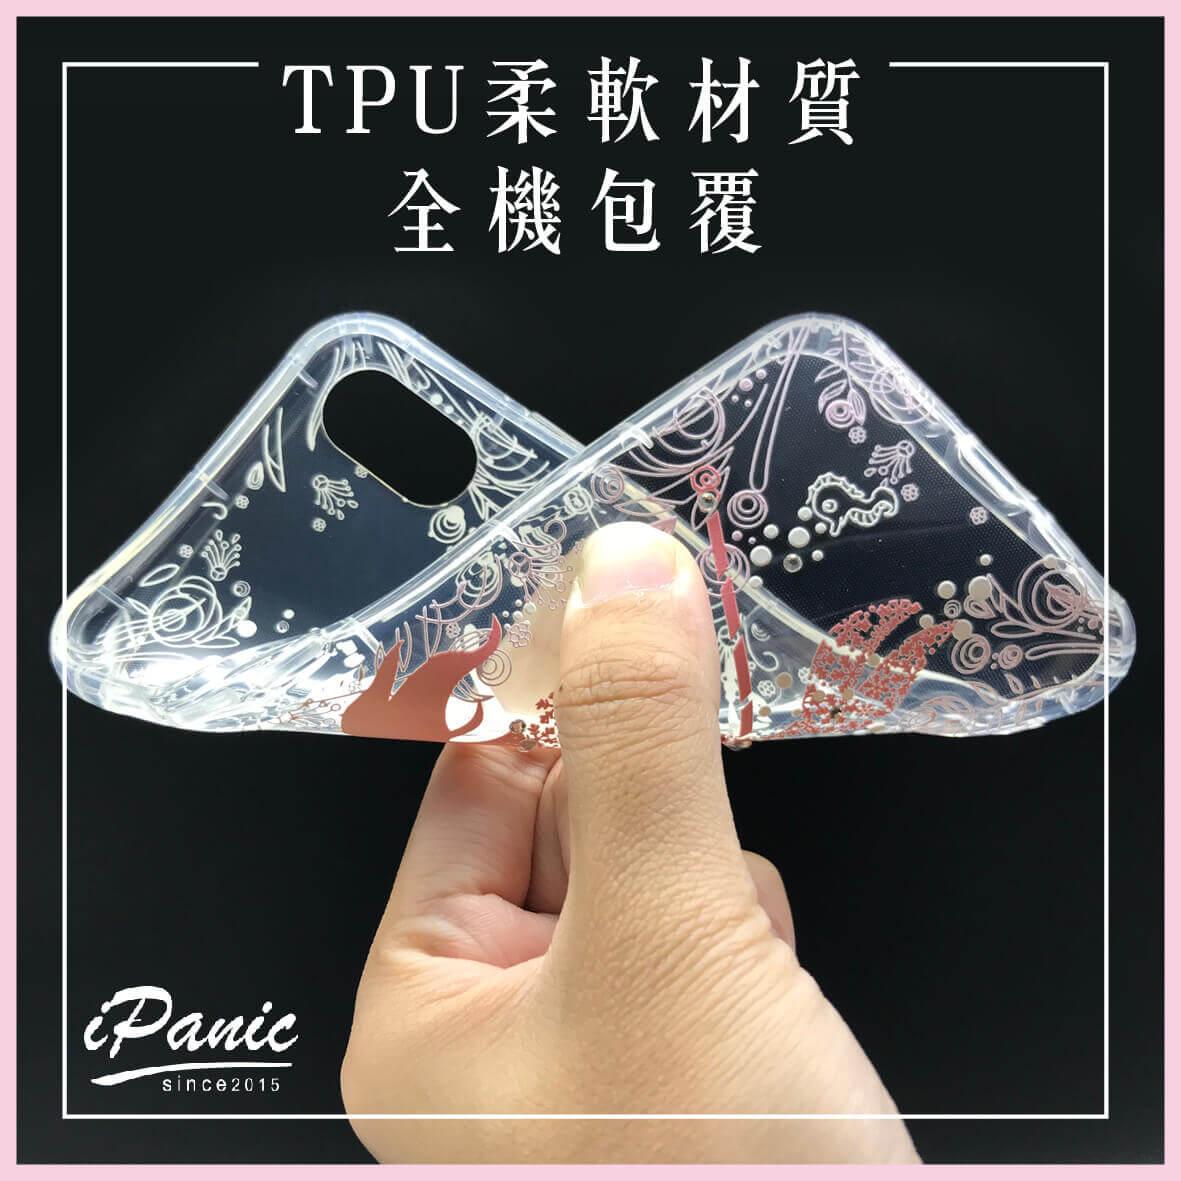 iPhone X iPhone8 iPhone7 plus 3D立體浮雕 水鑽手機殼 粉色嫁紗 iphone手機殼